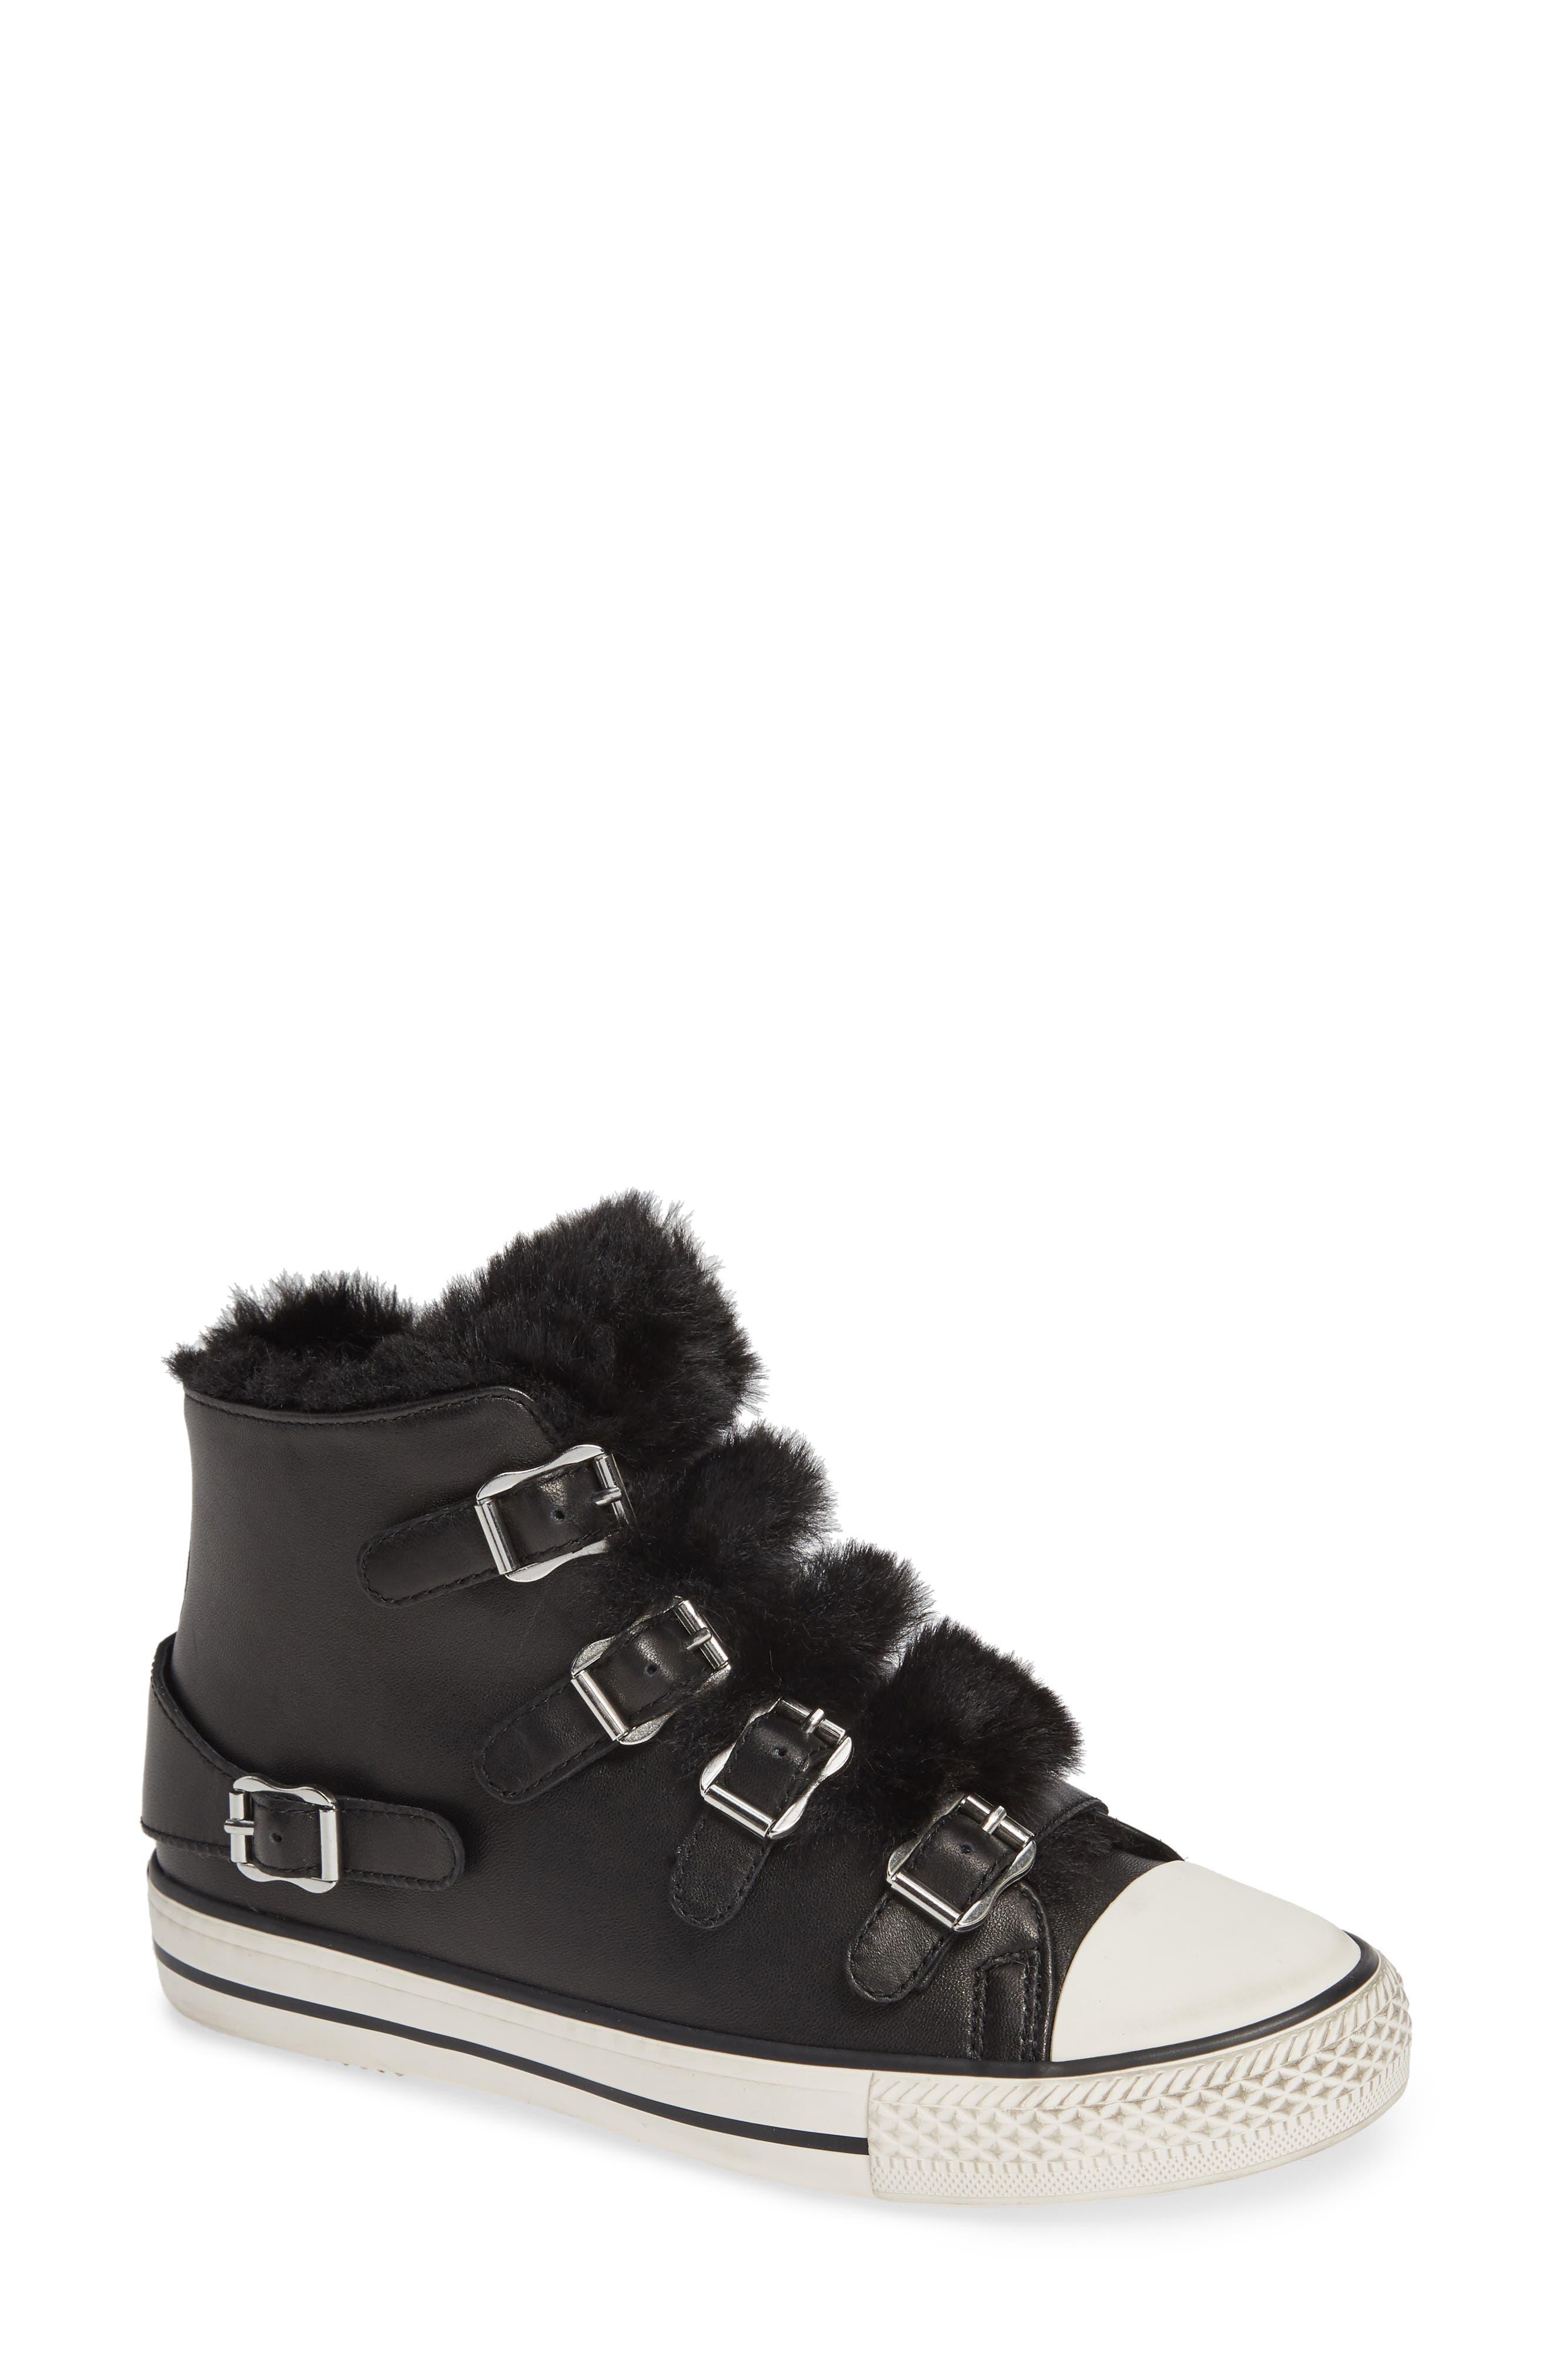 ASH, Valko High Top Sneaker, Main thumbnail 1, color, BLACK/ BLACK FAUX FUR